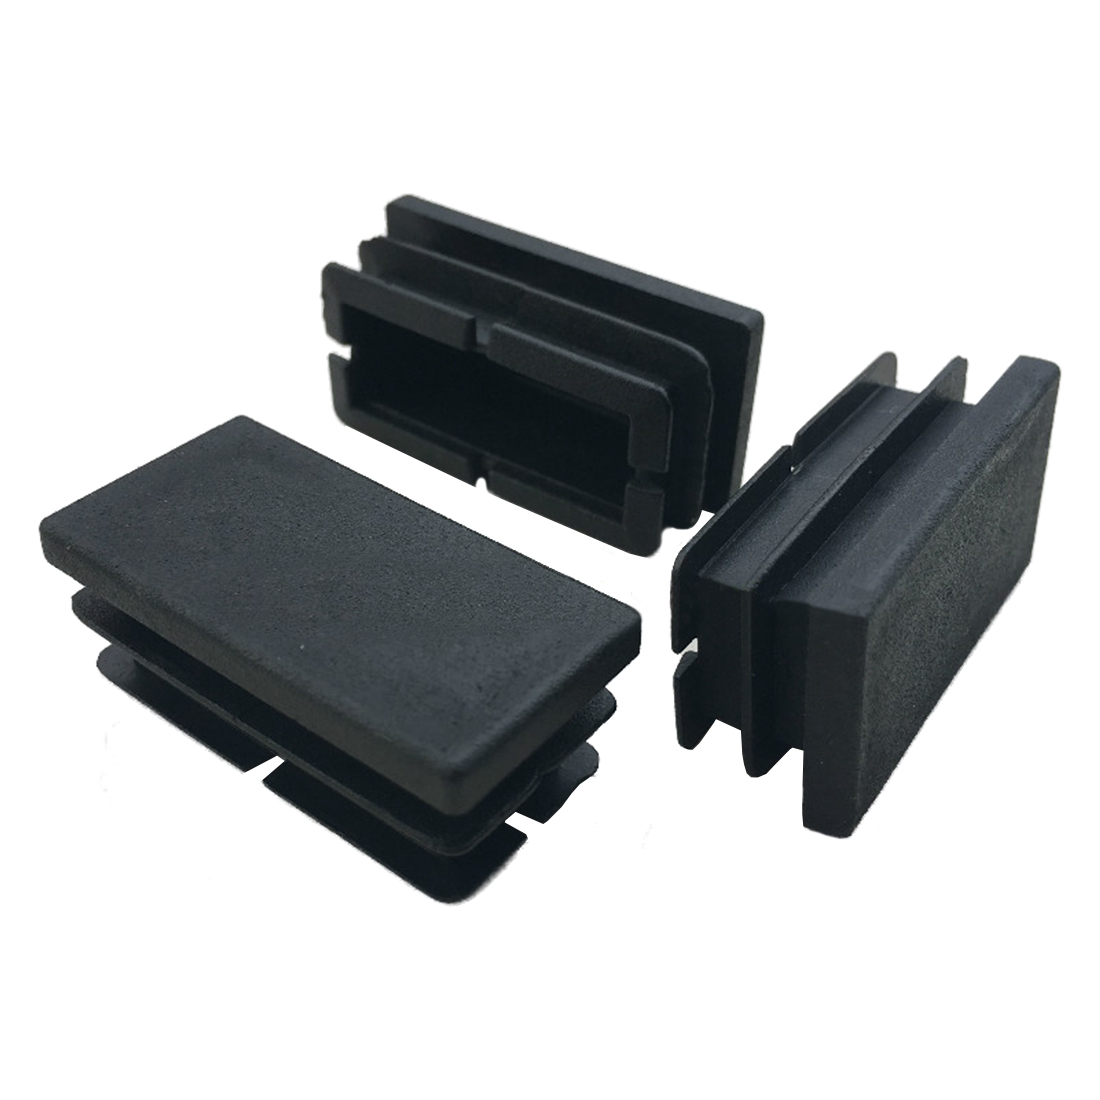 Hot Sale 8 Pcs Black Plastic Rectangular Blanking End Caps Inserts 20mm X 40mm